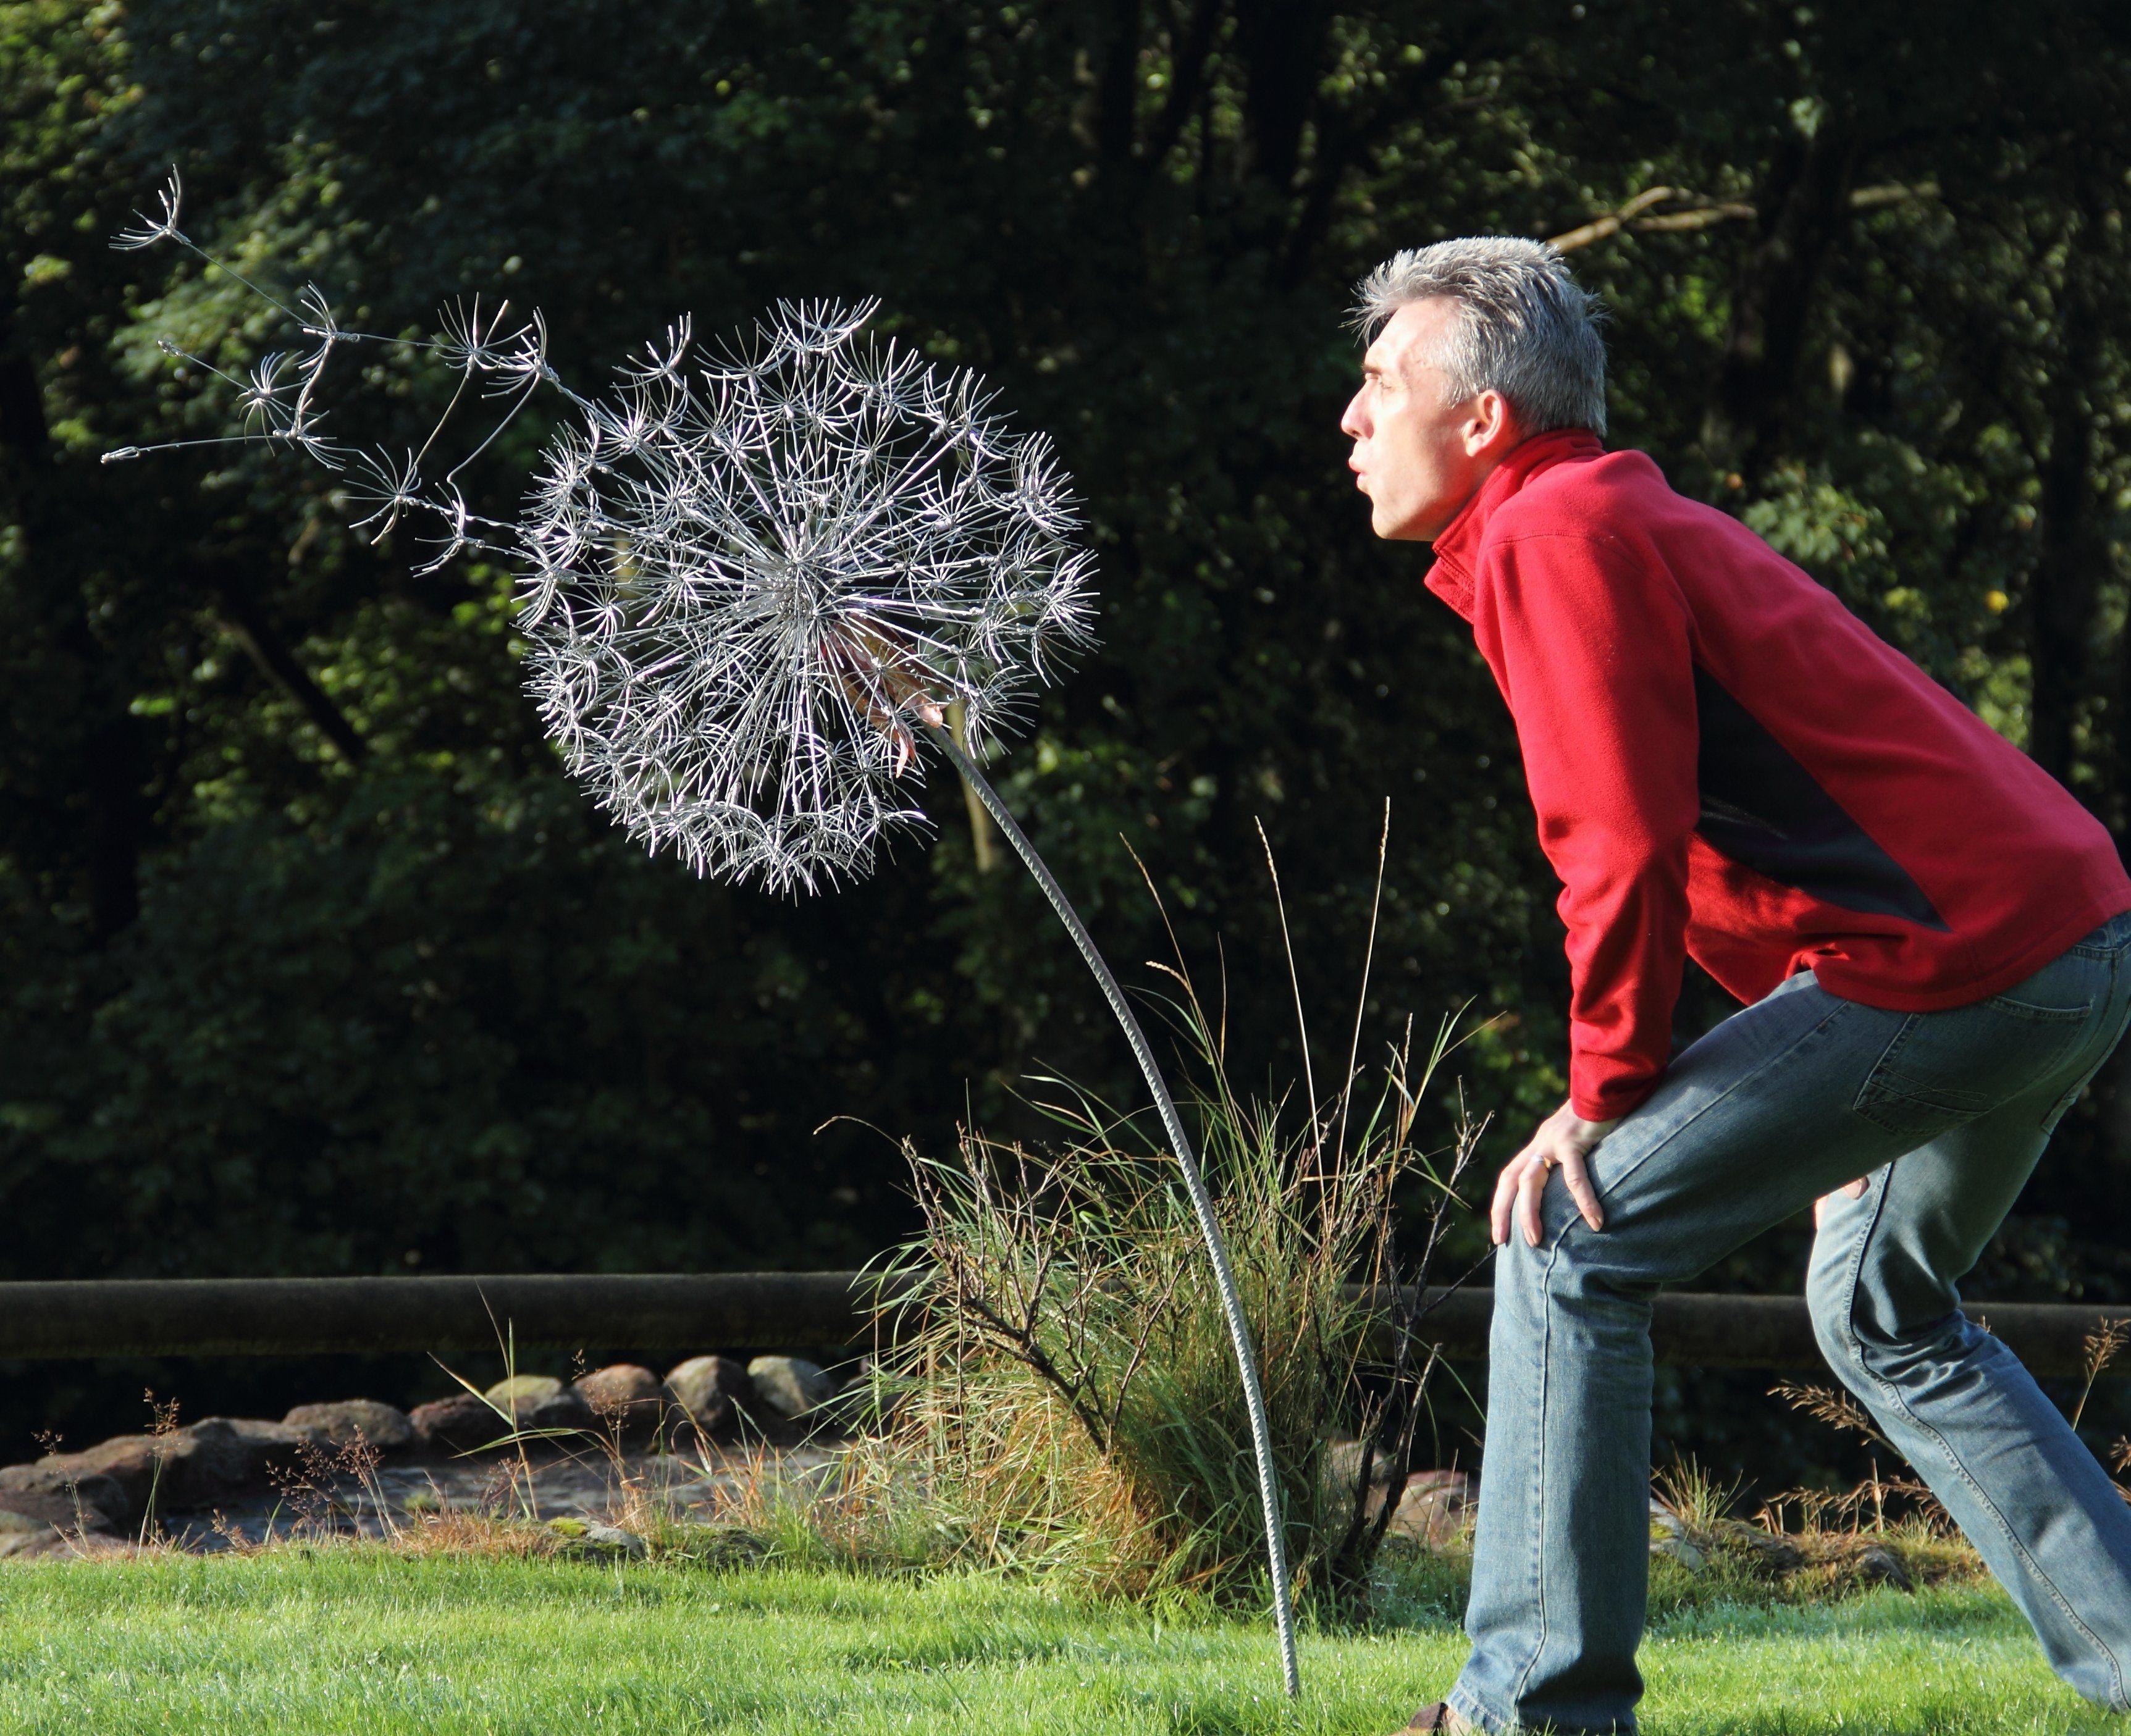 Dandelions Amazing Wire Sculpture Artist Robin Wight Check His